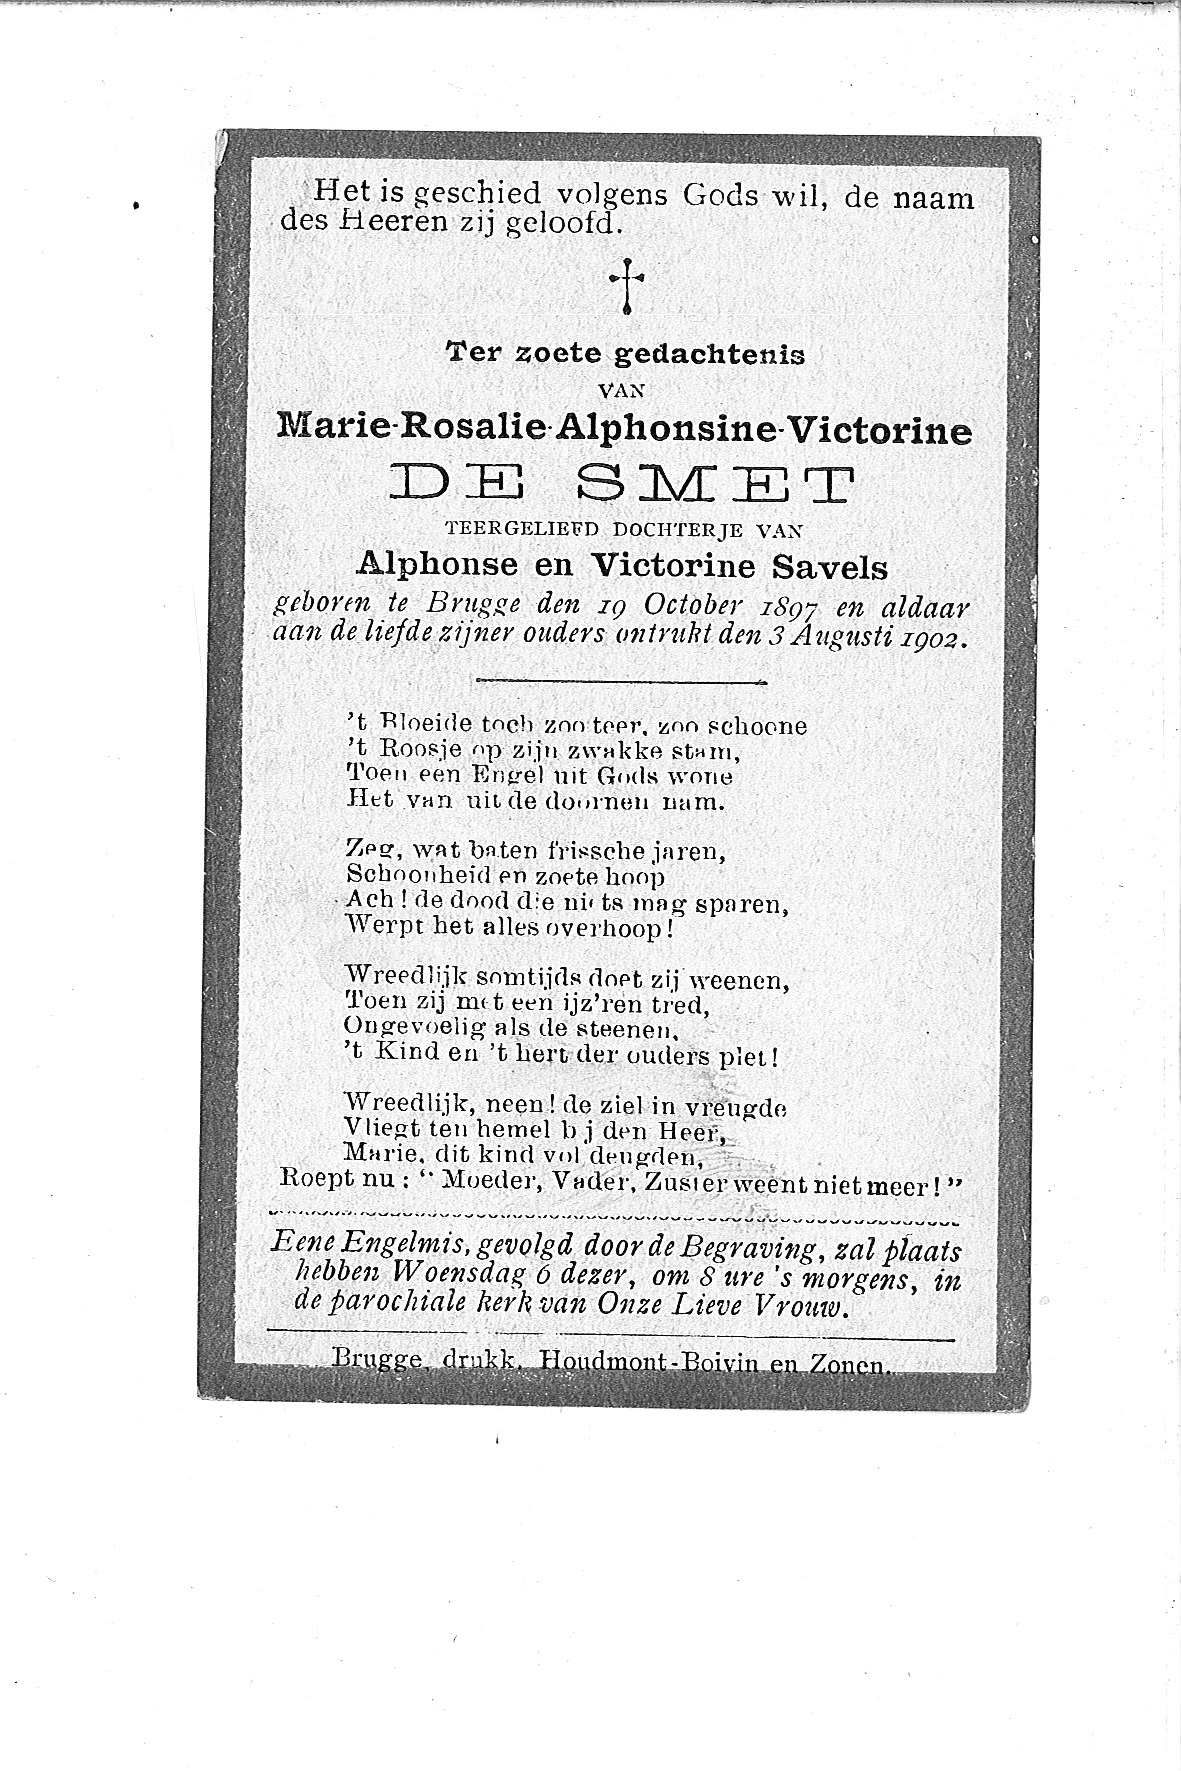 Marie-Rosalie-Alphonsine-Victorine (1902) 20120424103450_00350.jpg